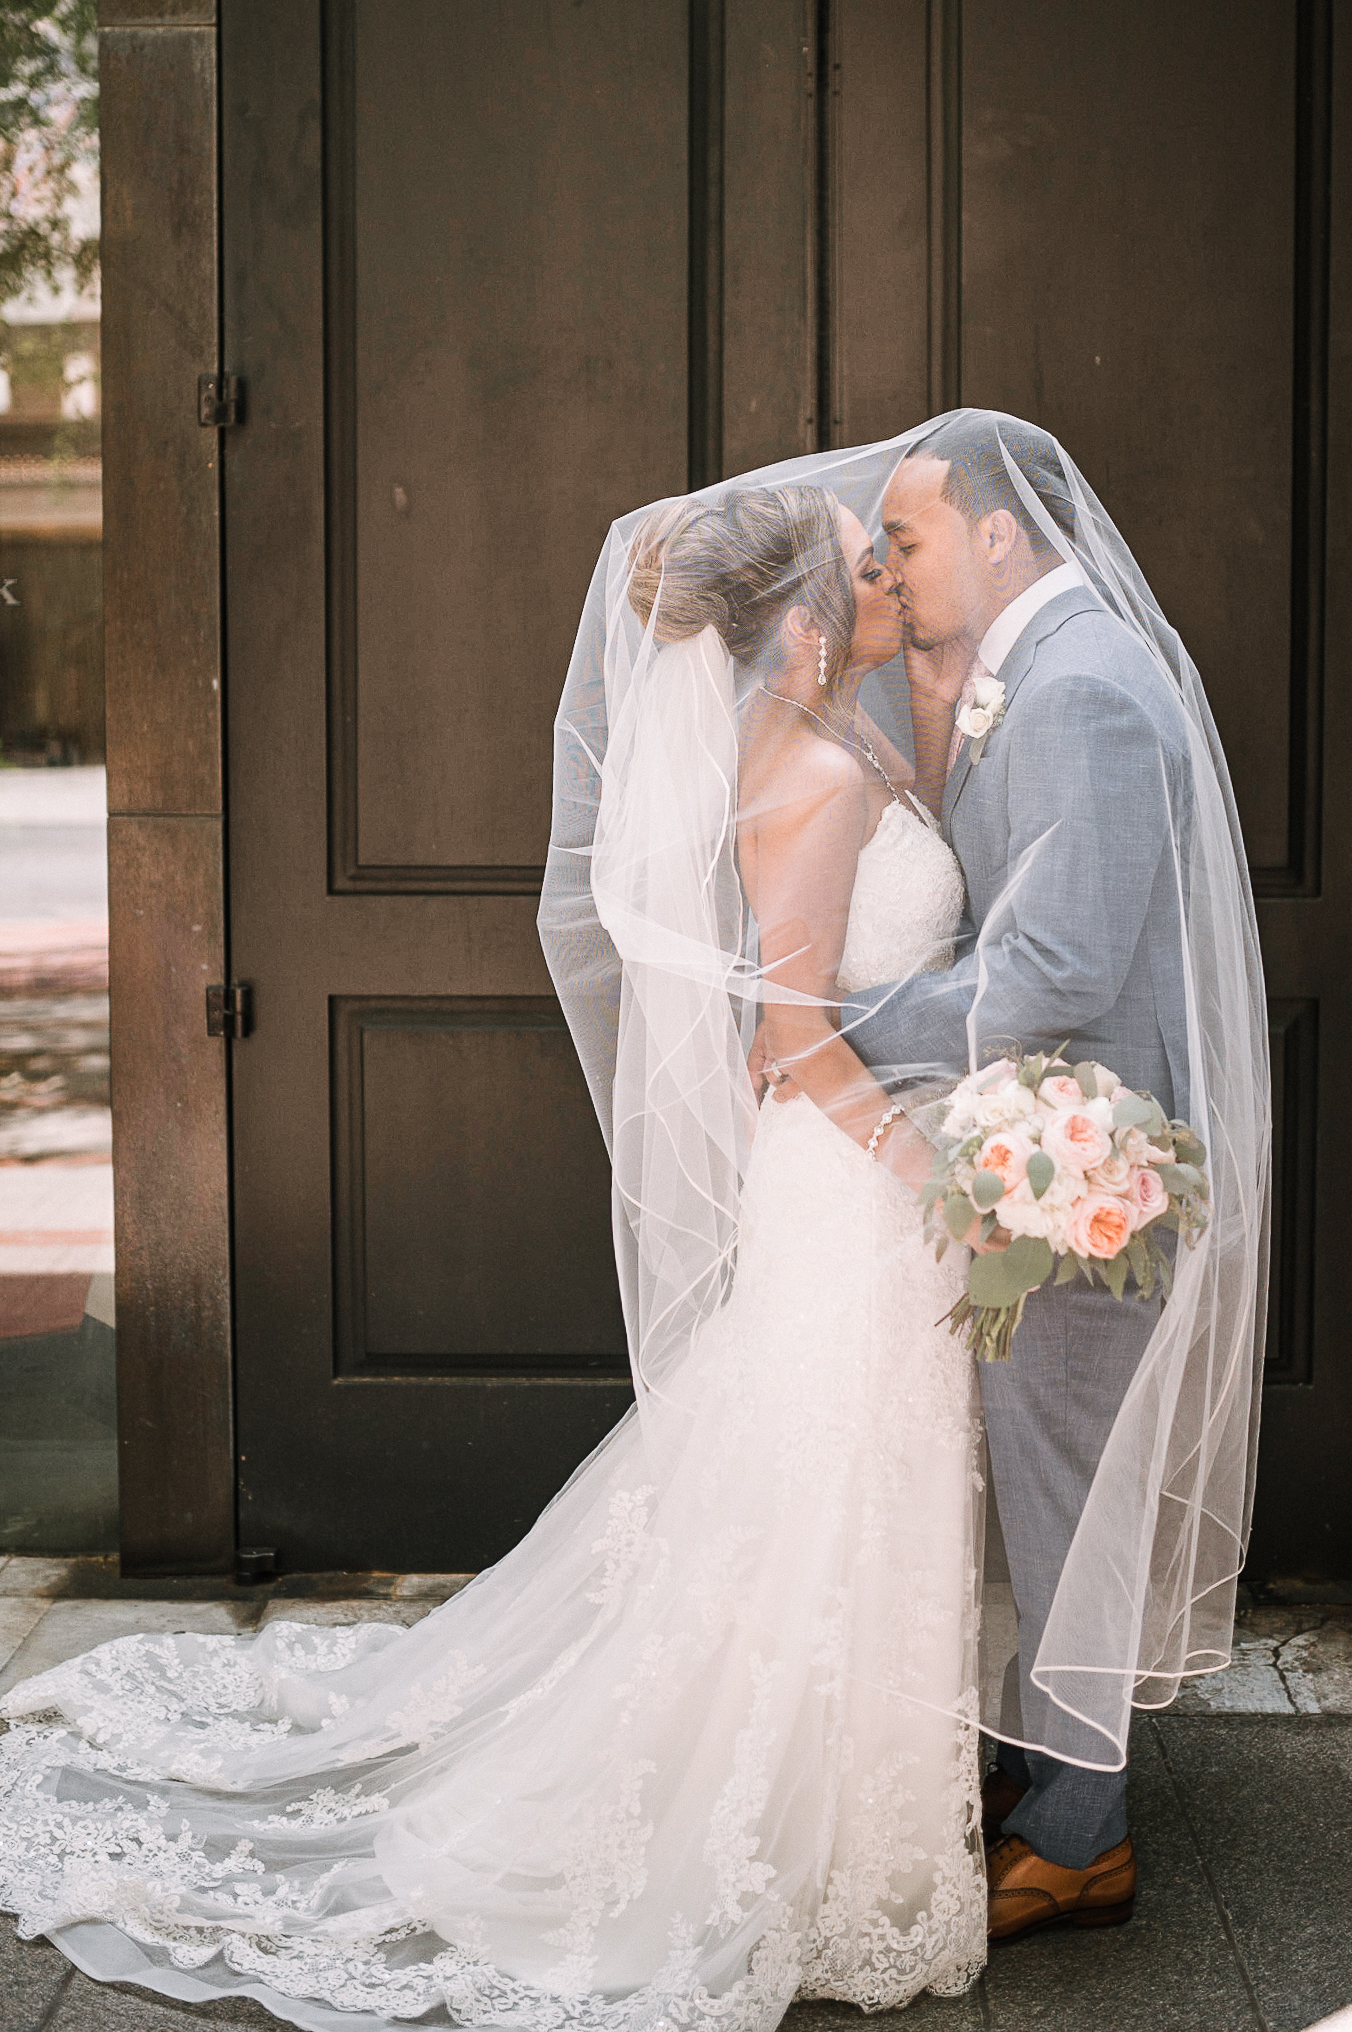 bride and groom kissing under veil at The Park Hyatt Hotel in Washington DC